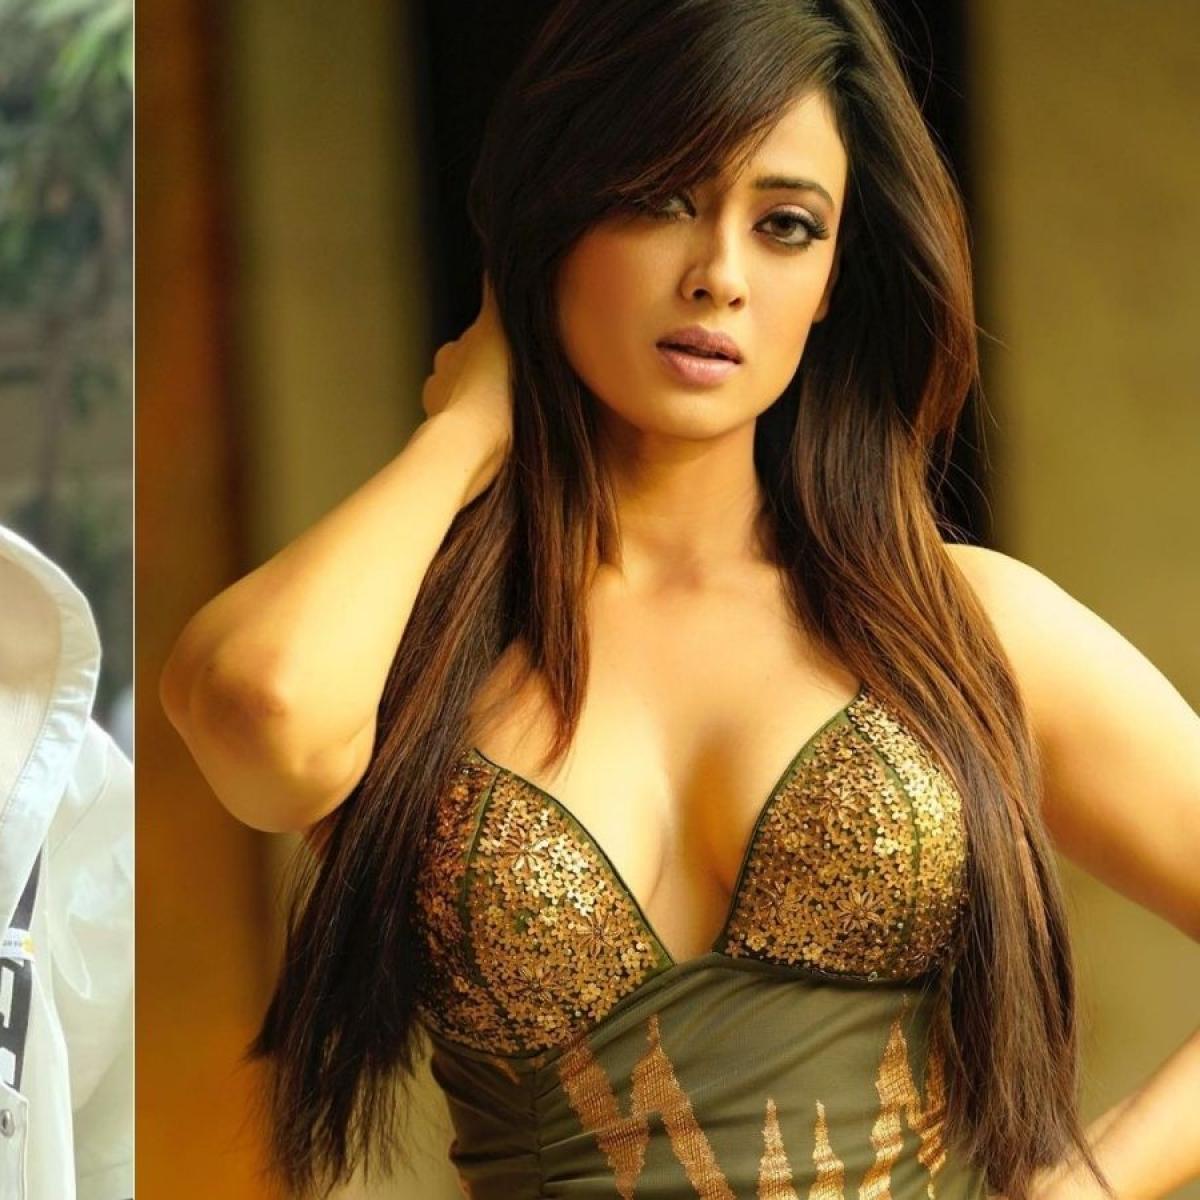 Watch: Shweta Tiwari, 40, flaunts her abs, impresses 'Khatron Ke Khiladi' co-contestant Arjun Bijlani